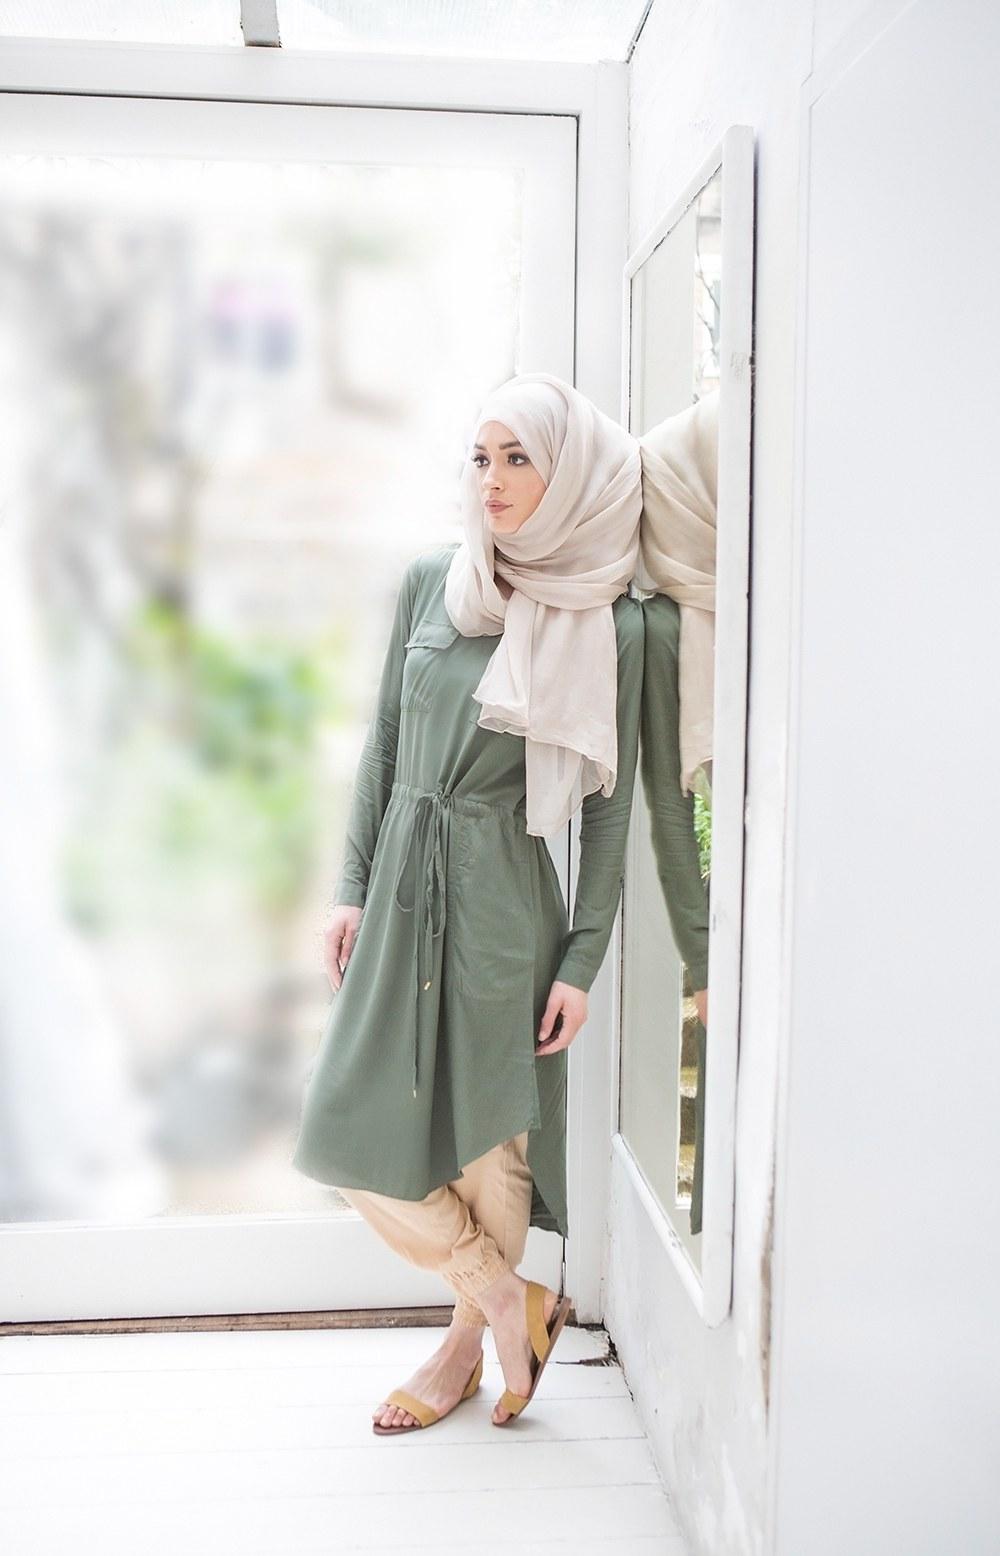 Design Model Baju Lebaran 2018 Irdz 25 Trend Model Baju Muslim Lebaran 2018 Simple & Modis